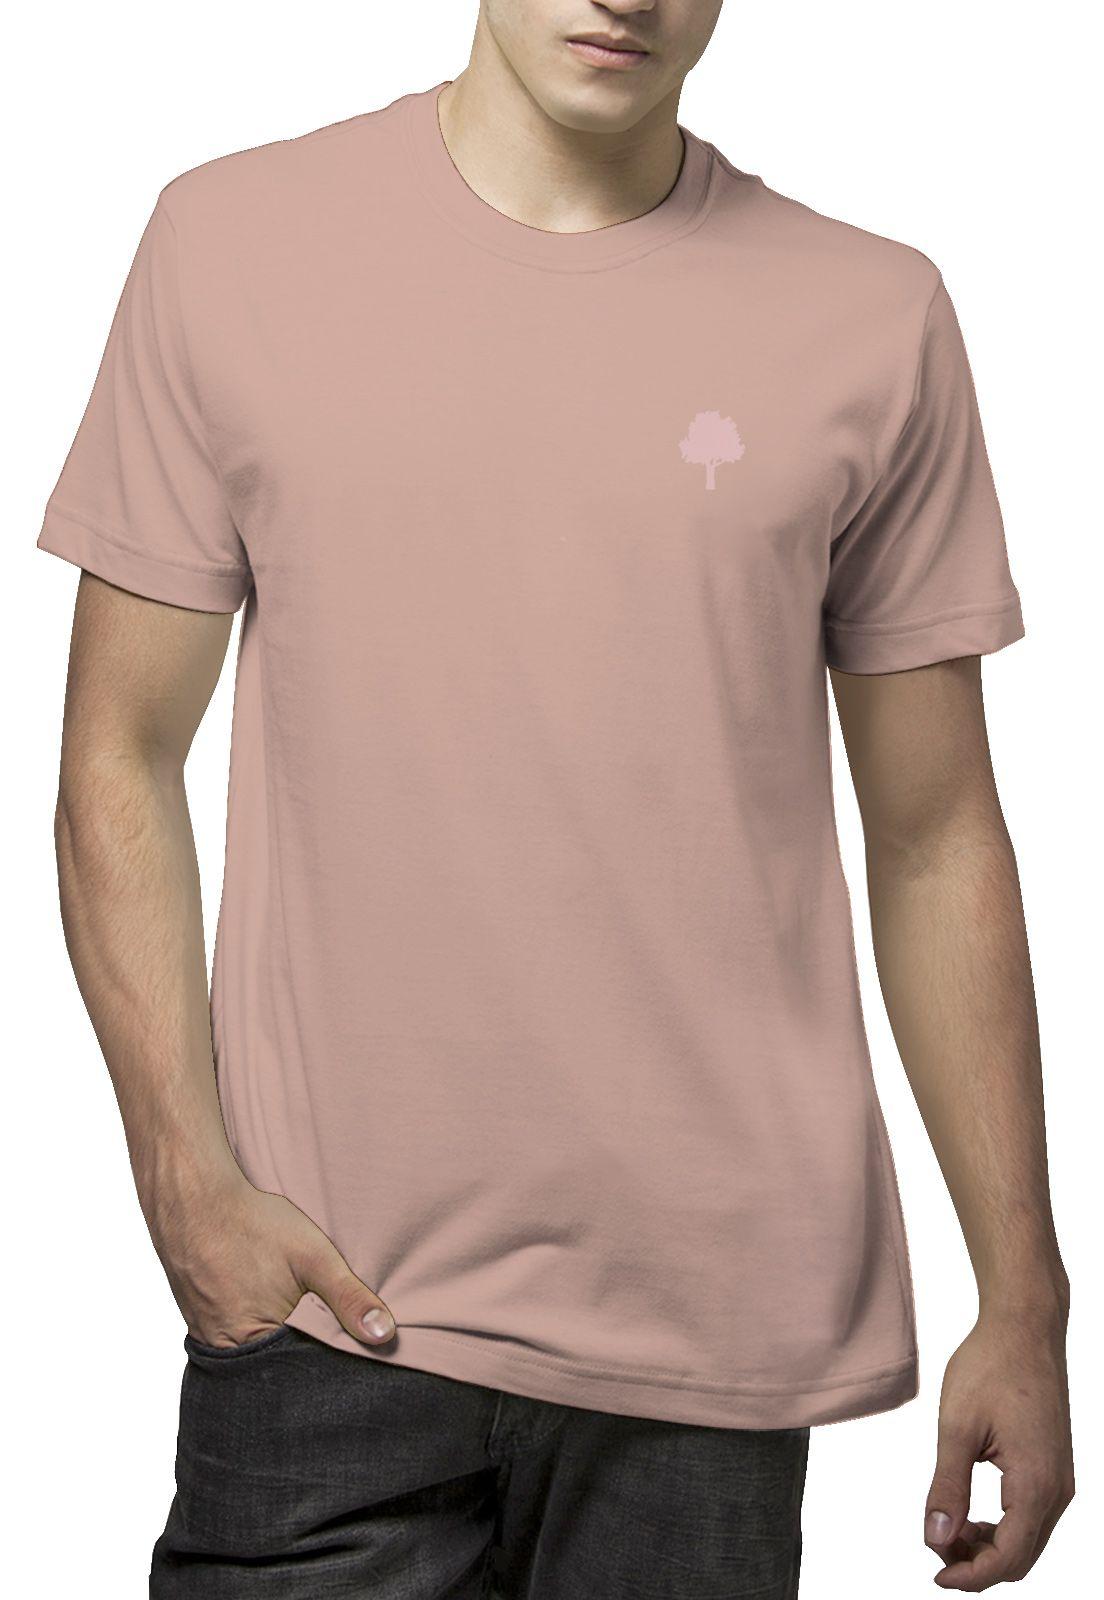 Camiseta Amazônia Básica Árvore Bordada - Rosa Claro